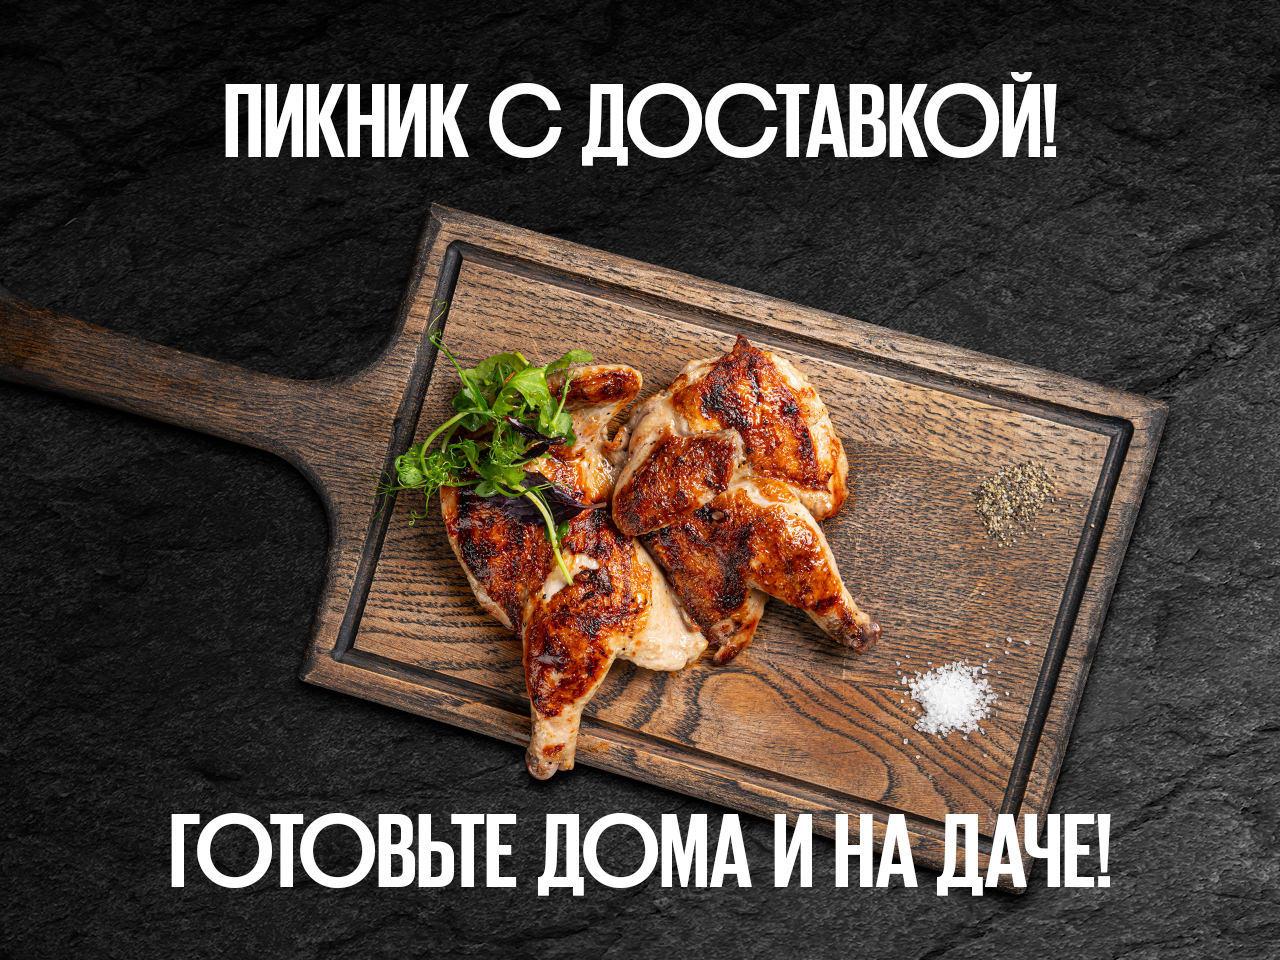 Жарьте вместе с Ч1 Васильчуки